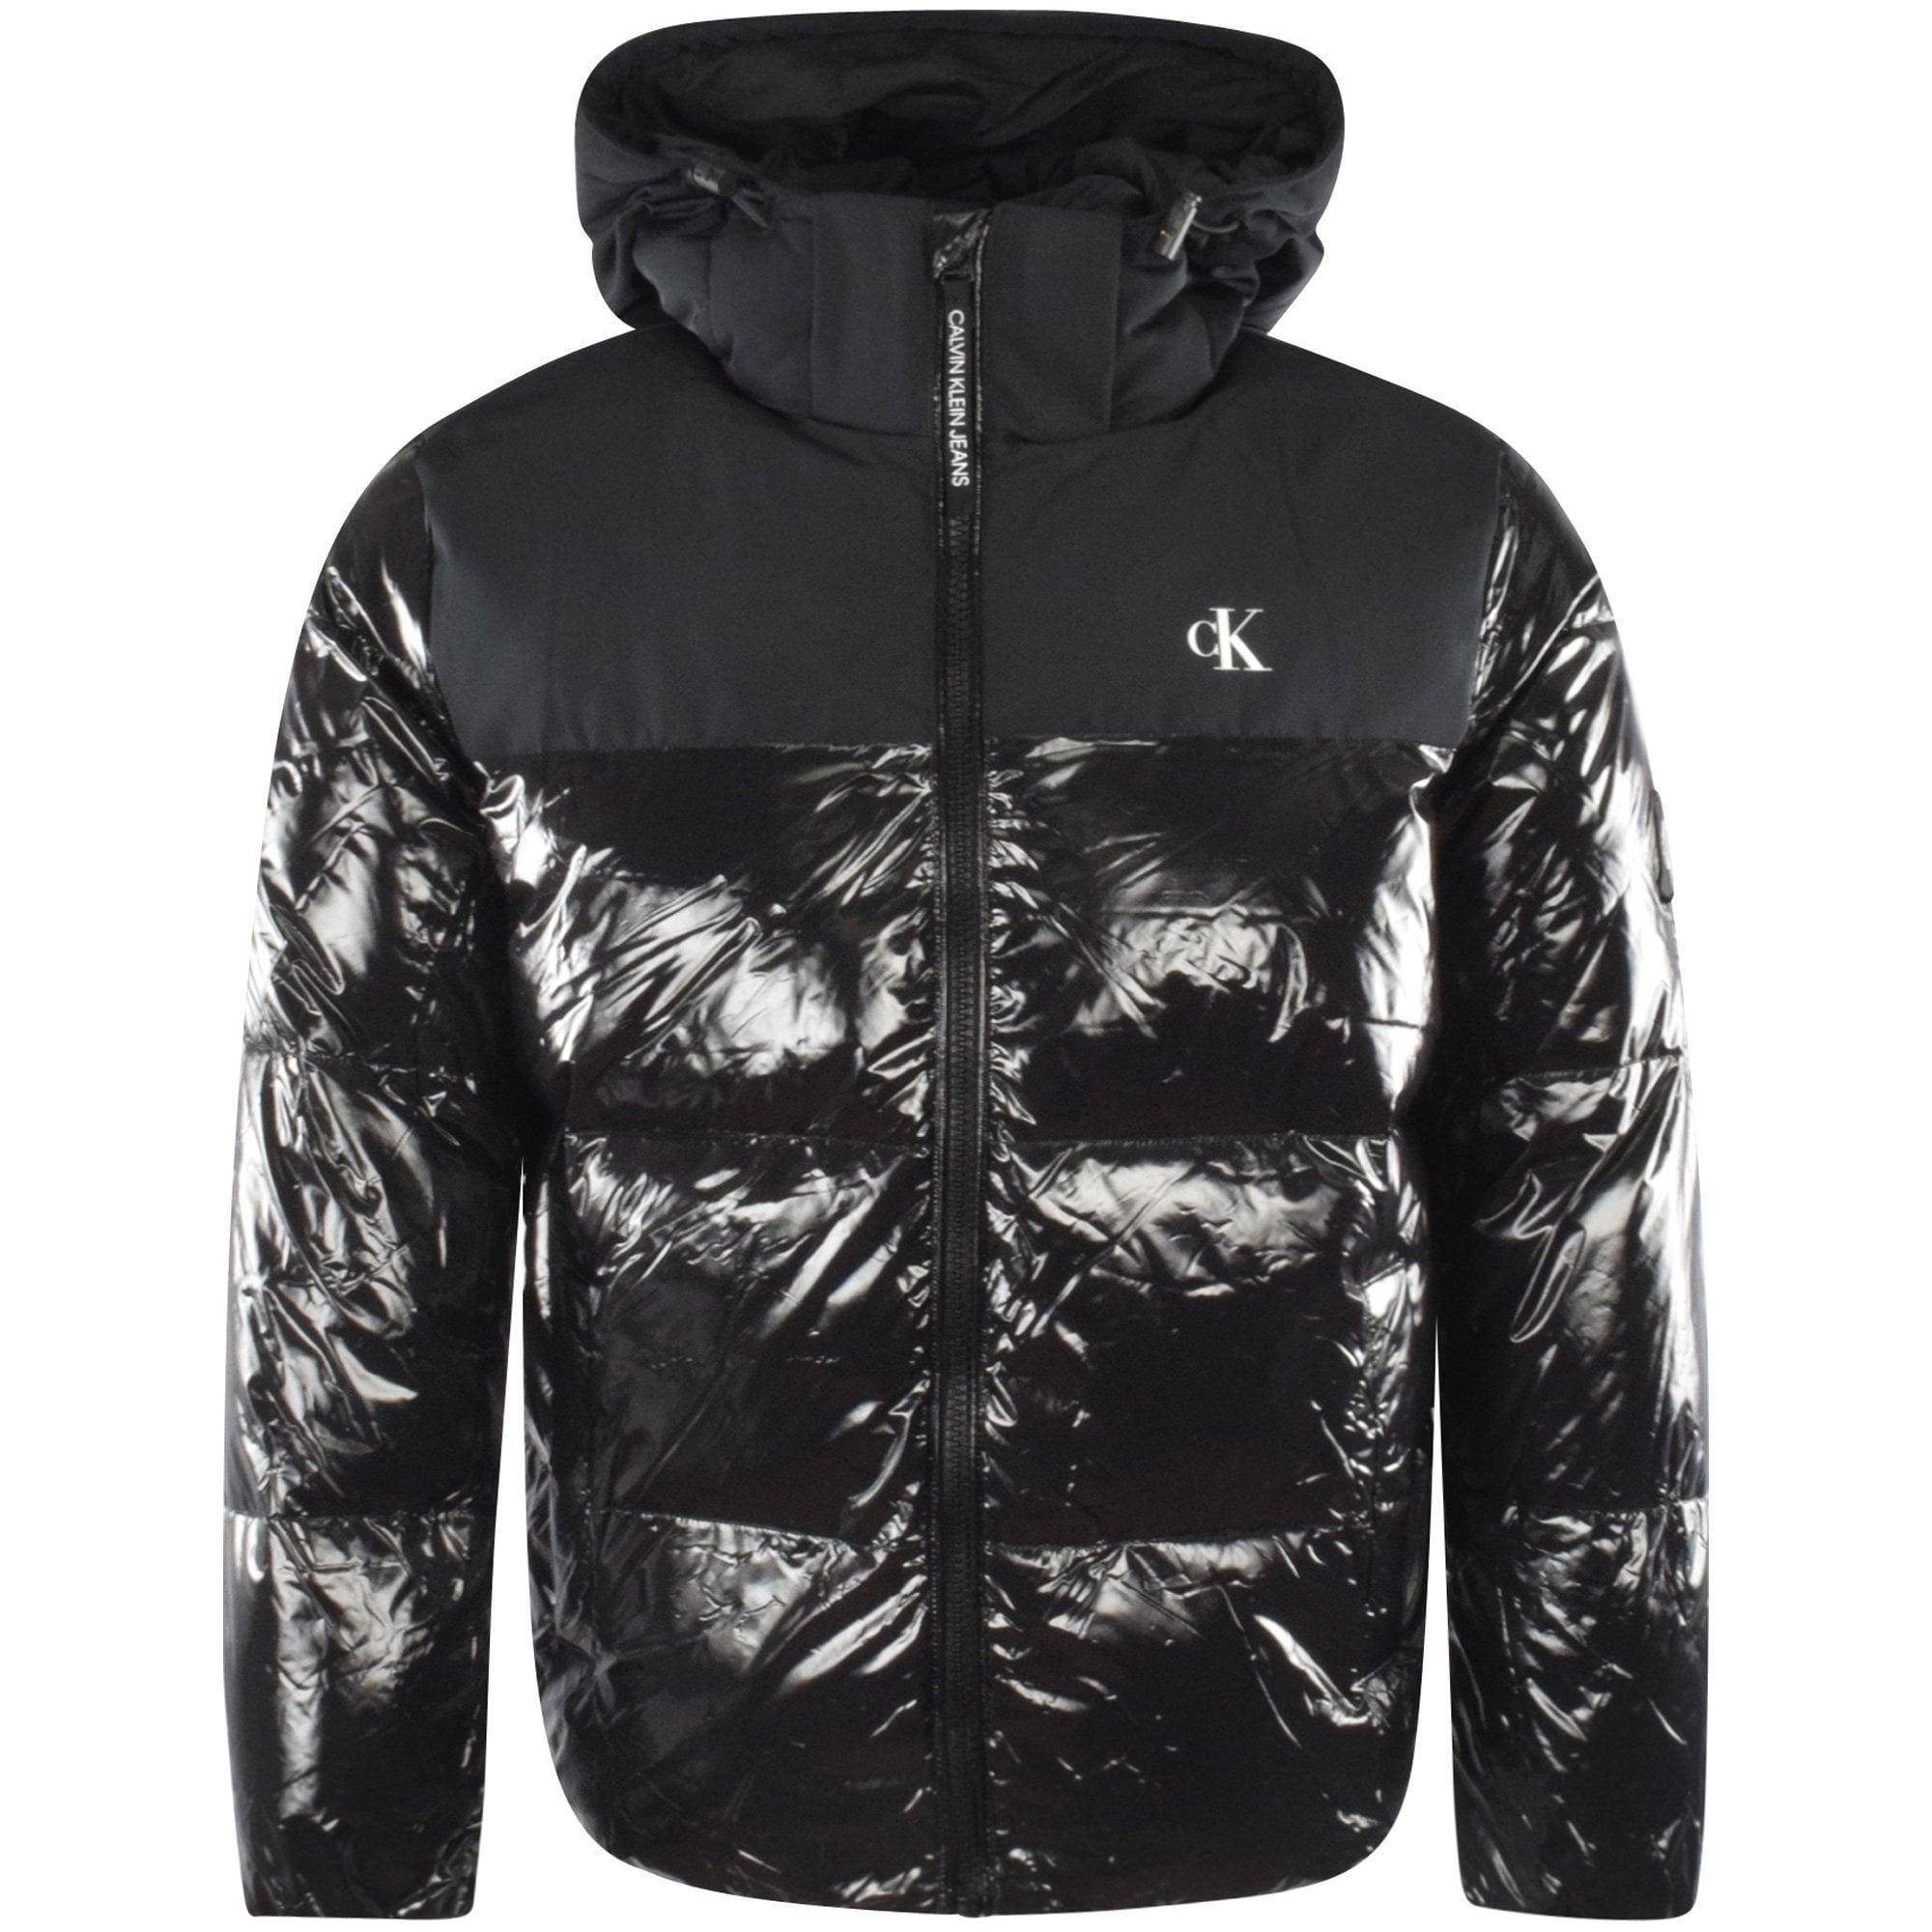 Calvin Klein Jeans puffer jacket in